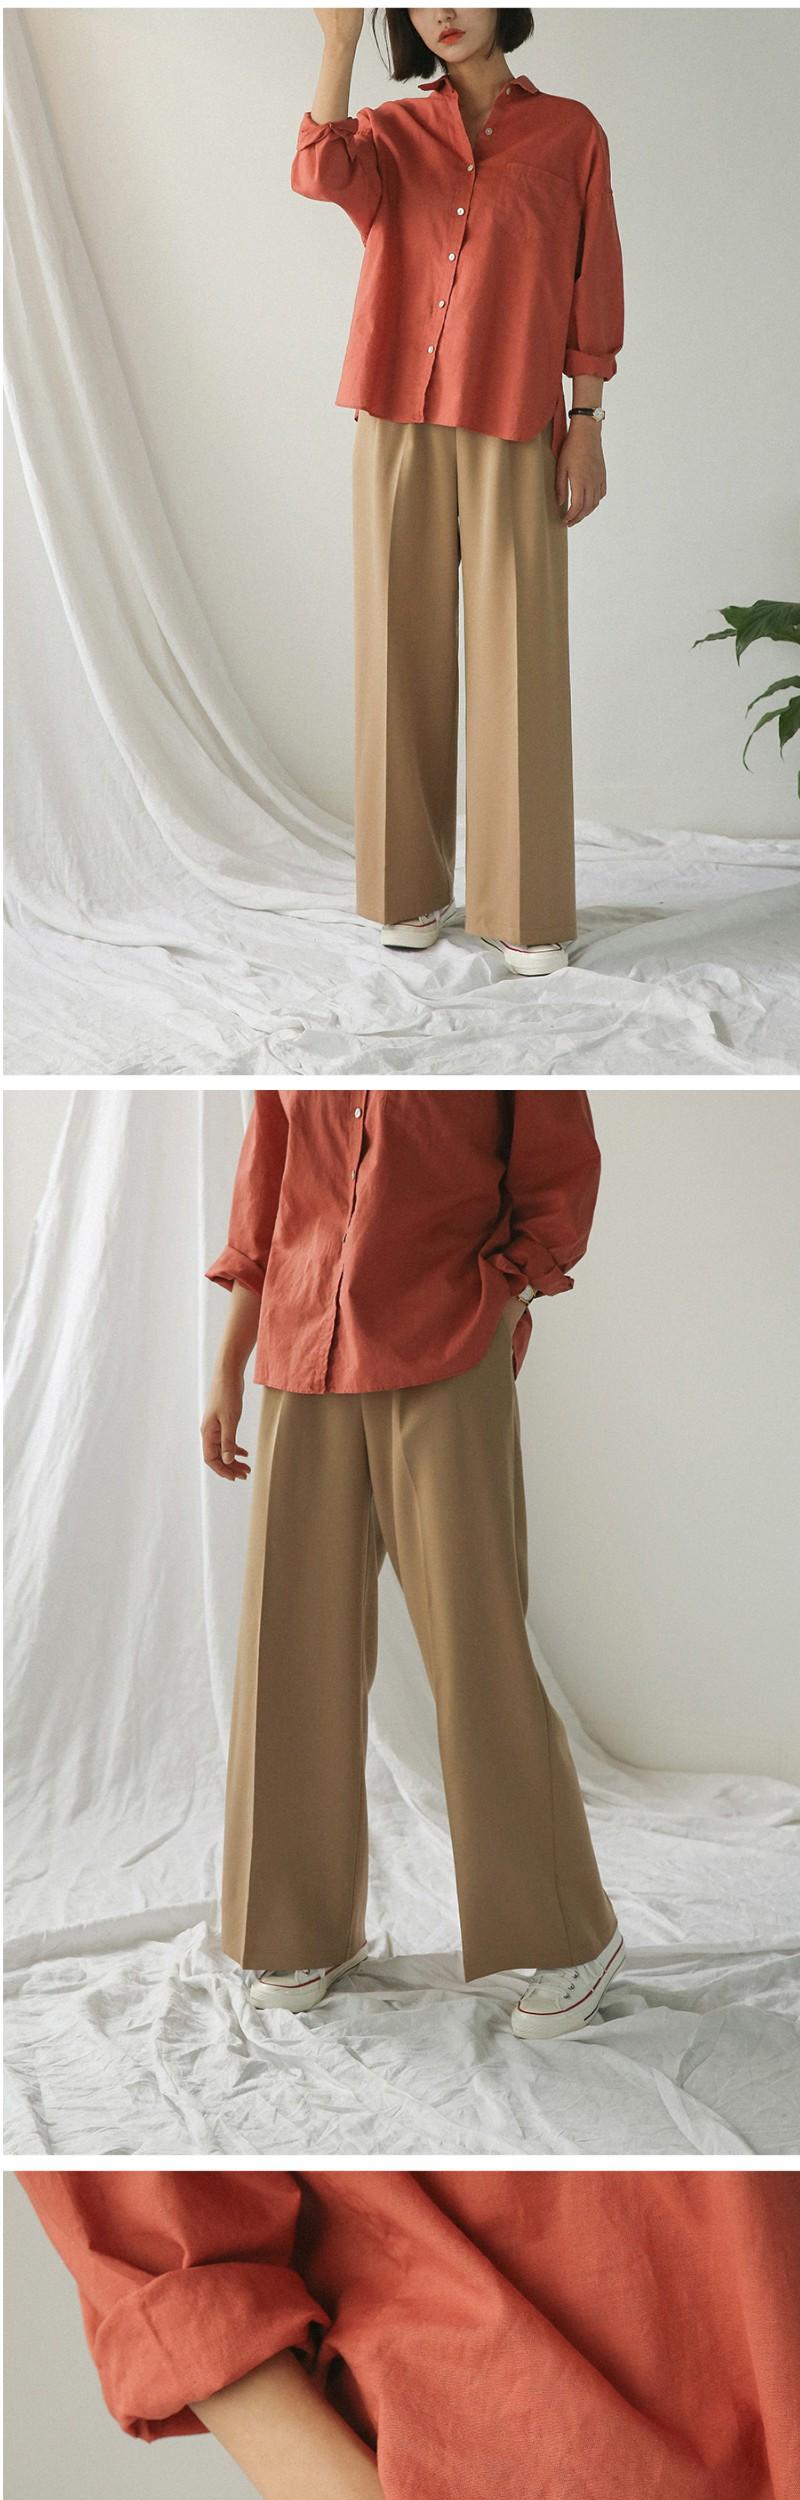 wide loose banding slacks